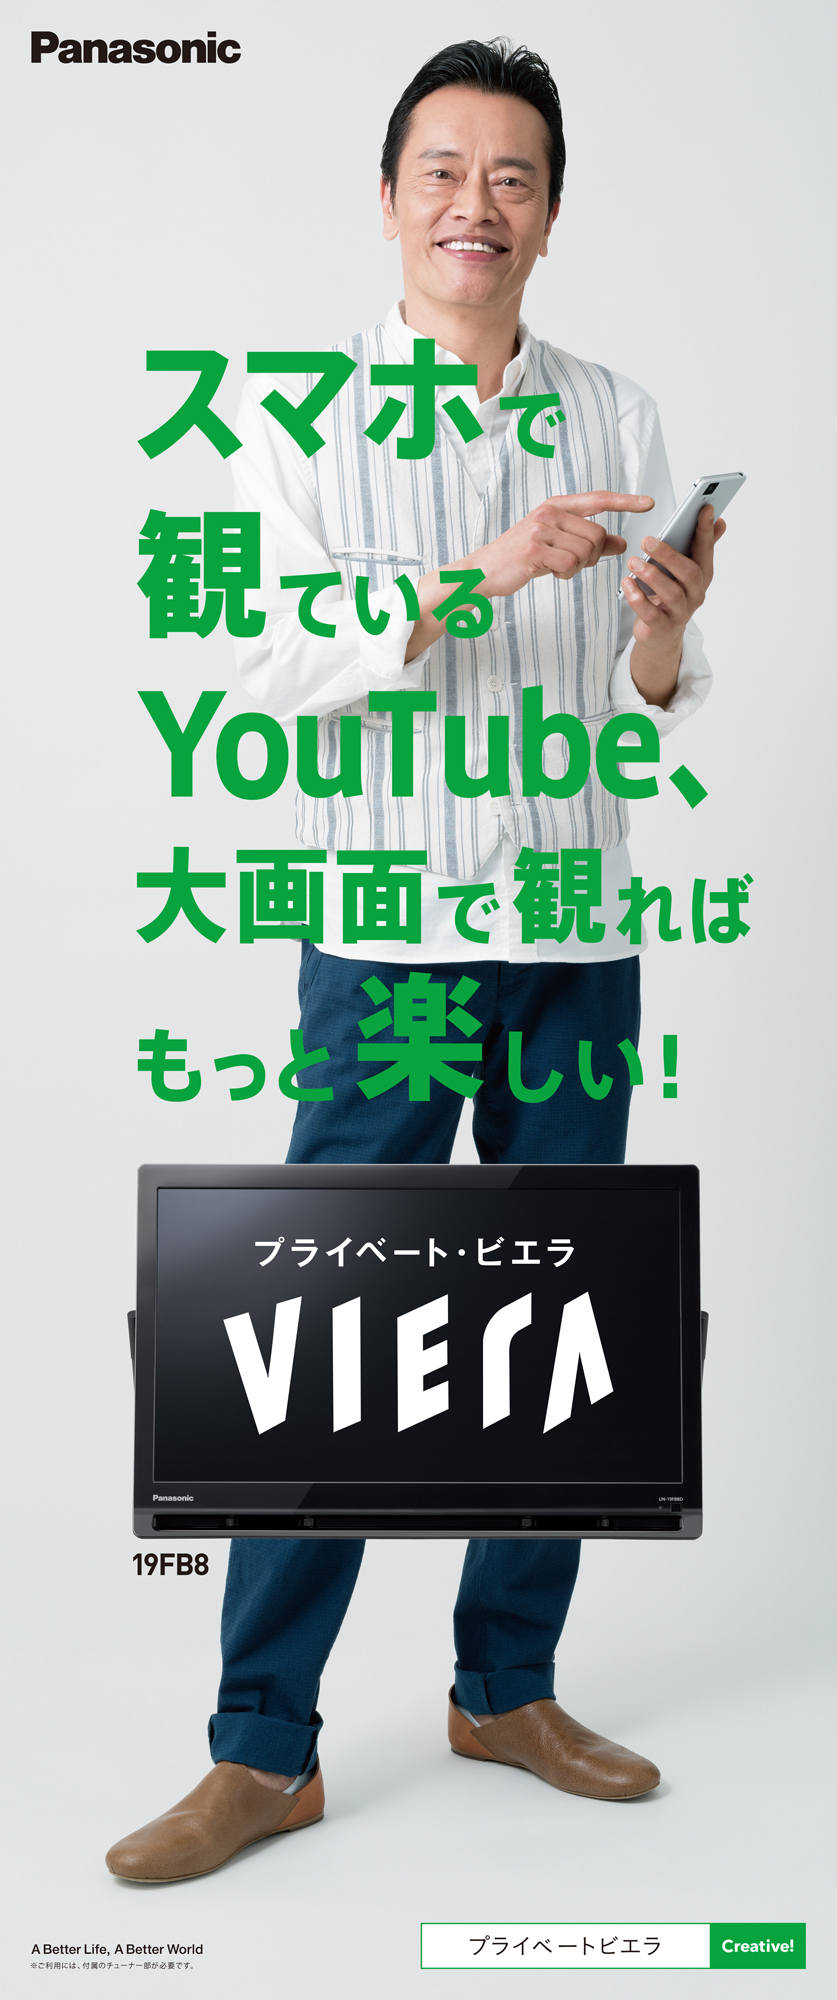 180530_PV_Q2ポイント02_入稿_ol.jpg